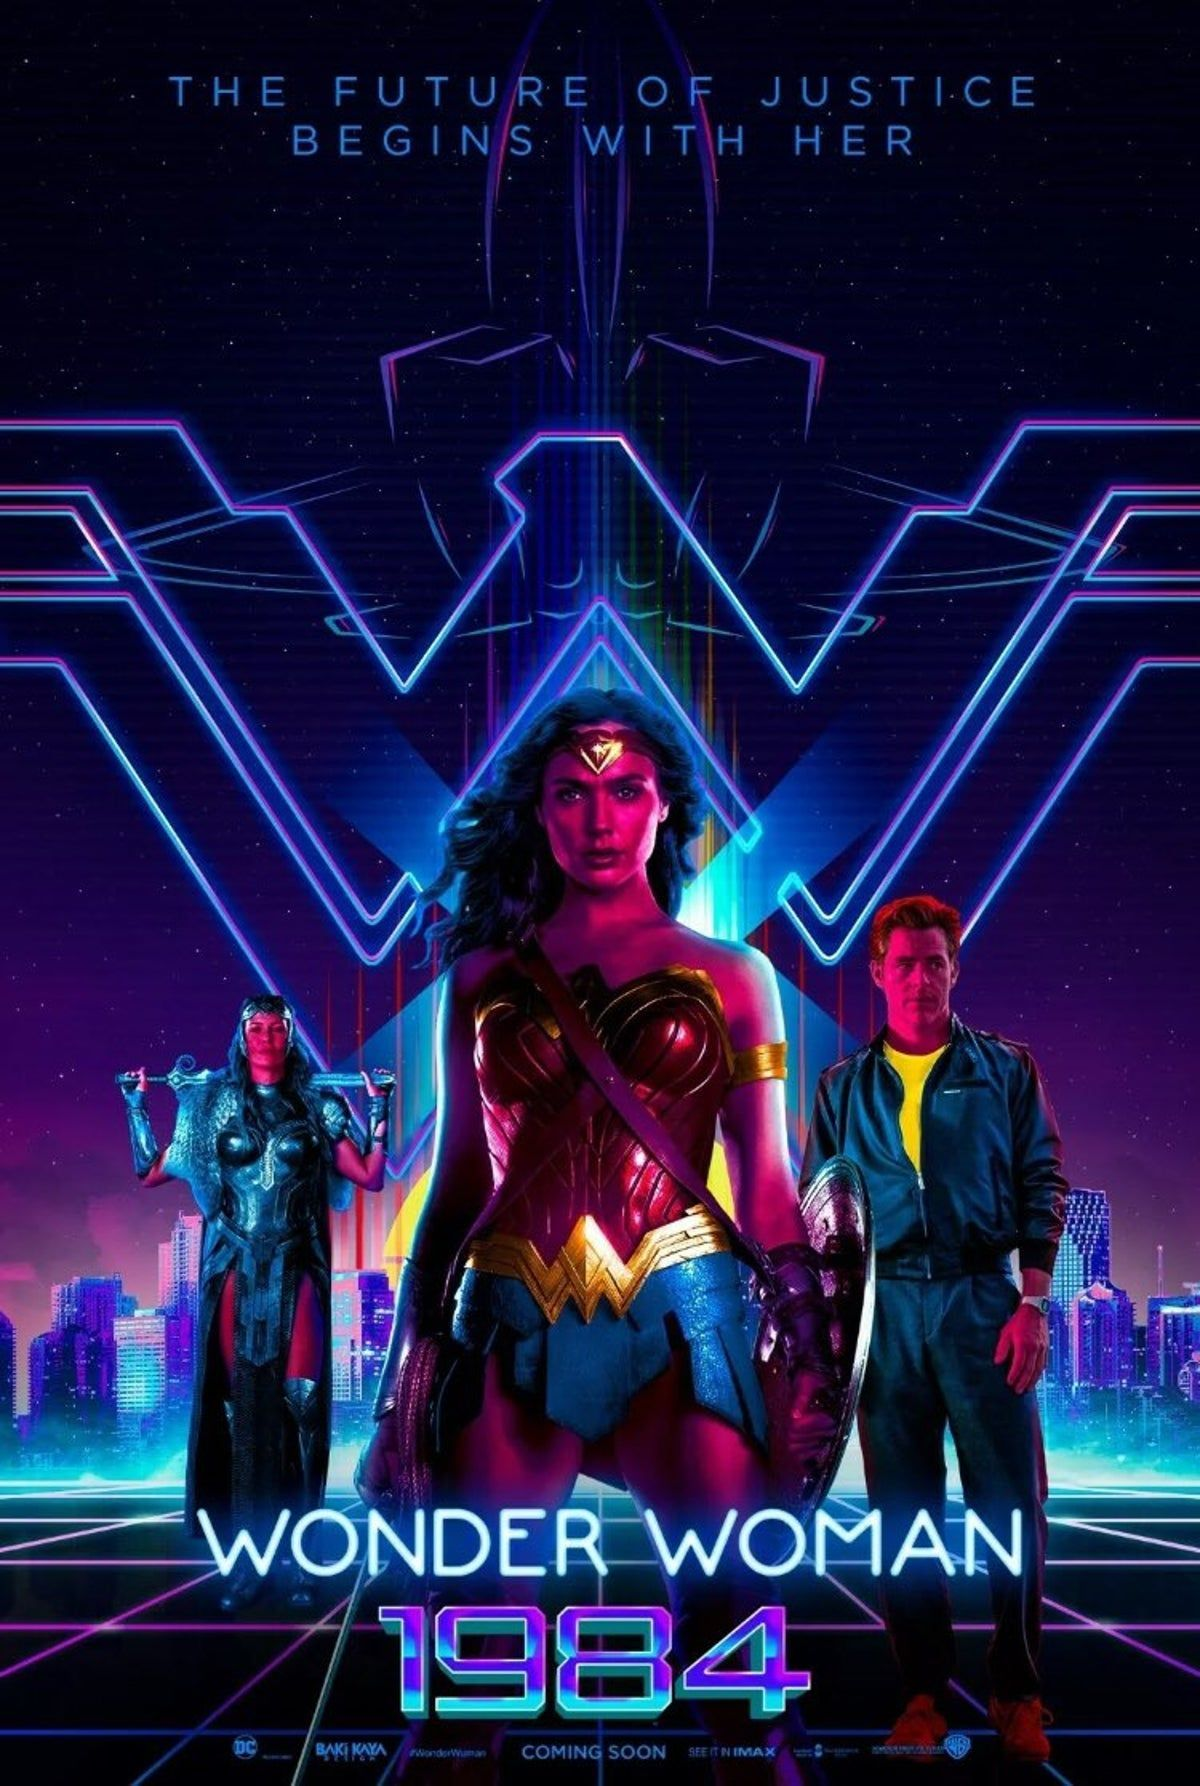 Download Wonder Woman 1984 Full Hd Free Minneapolispolicemurderdhim Survive2020in5words Sayhisname Agtpremiere Nhlplayoffs L